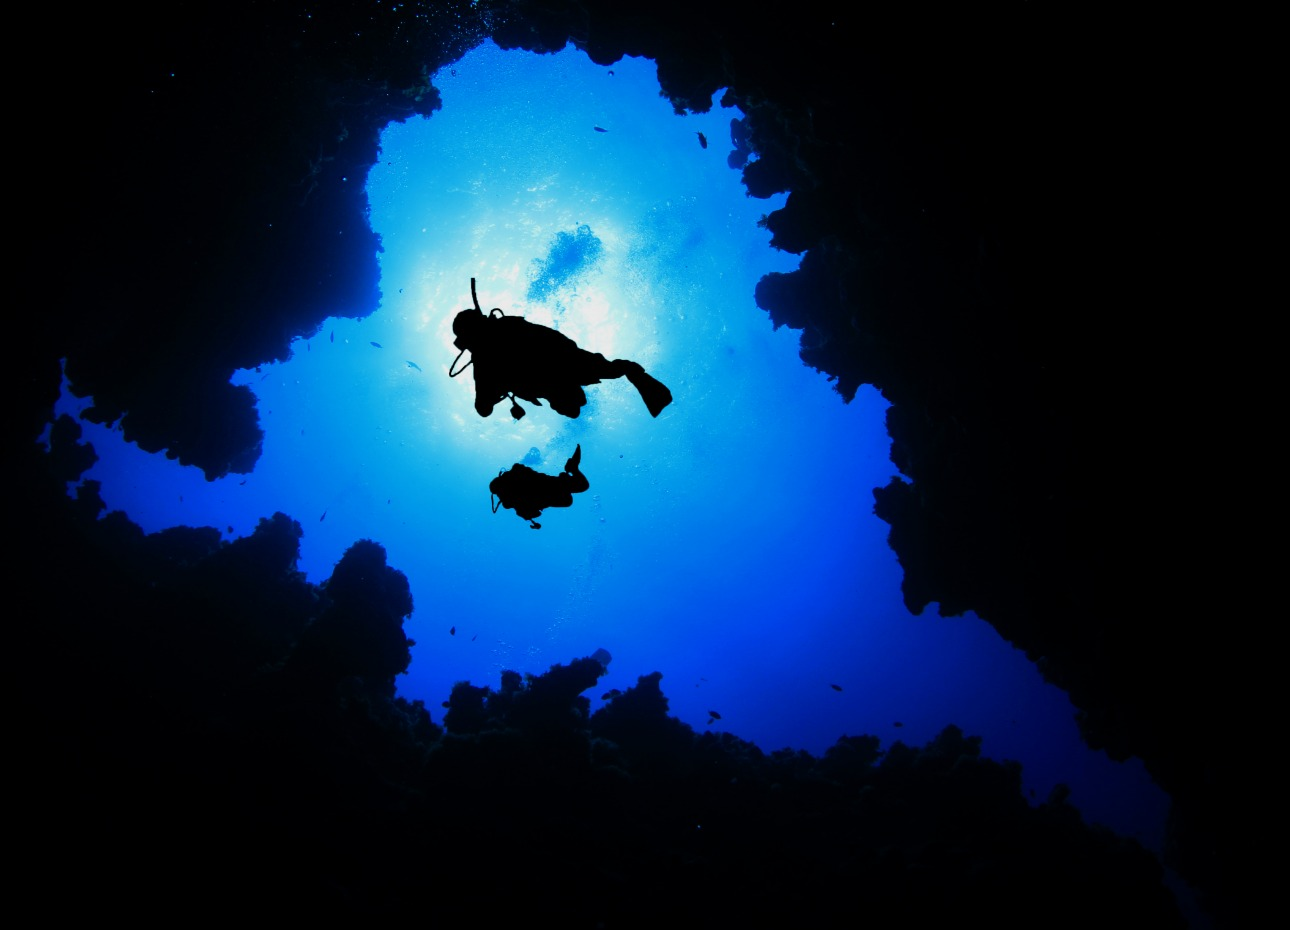 Scuba diver descends into a cave in the Bahamas